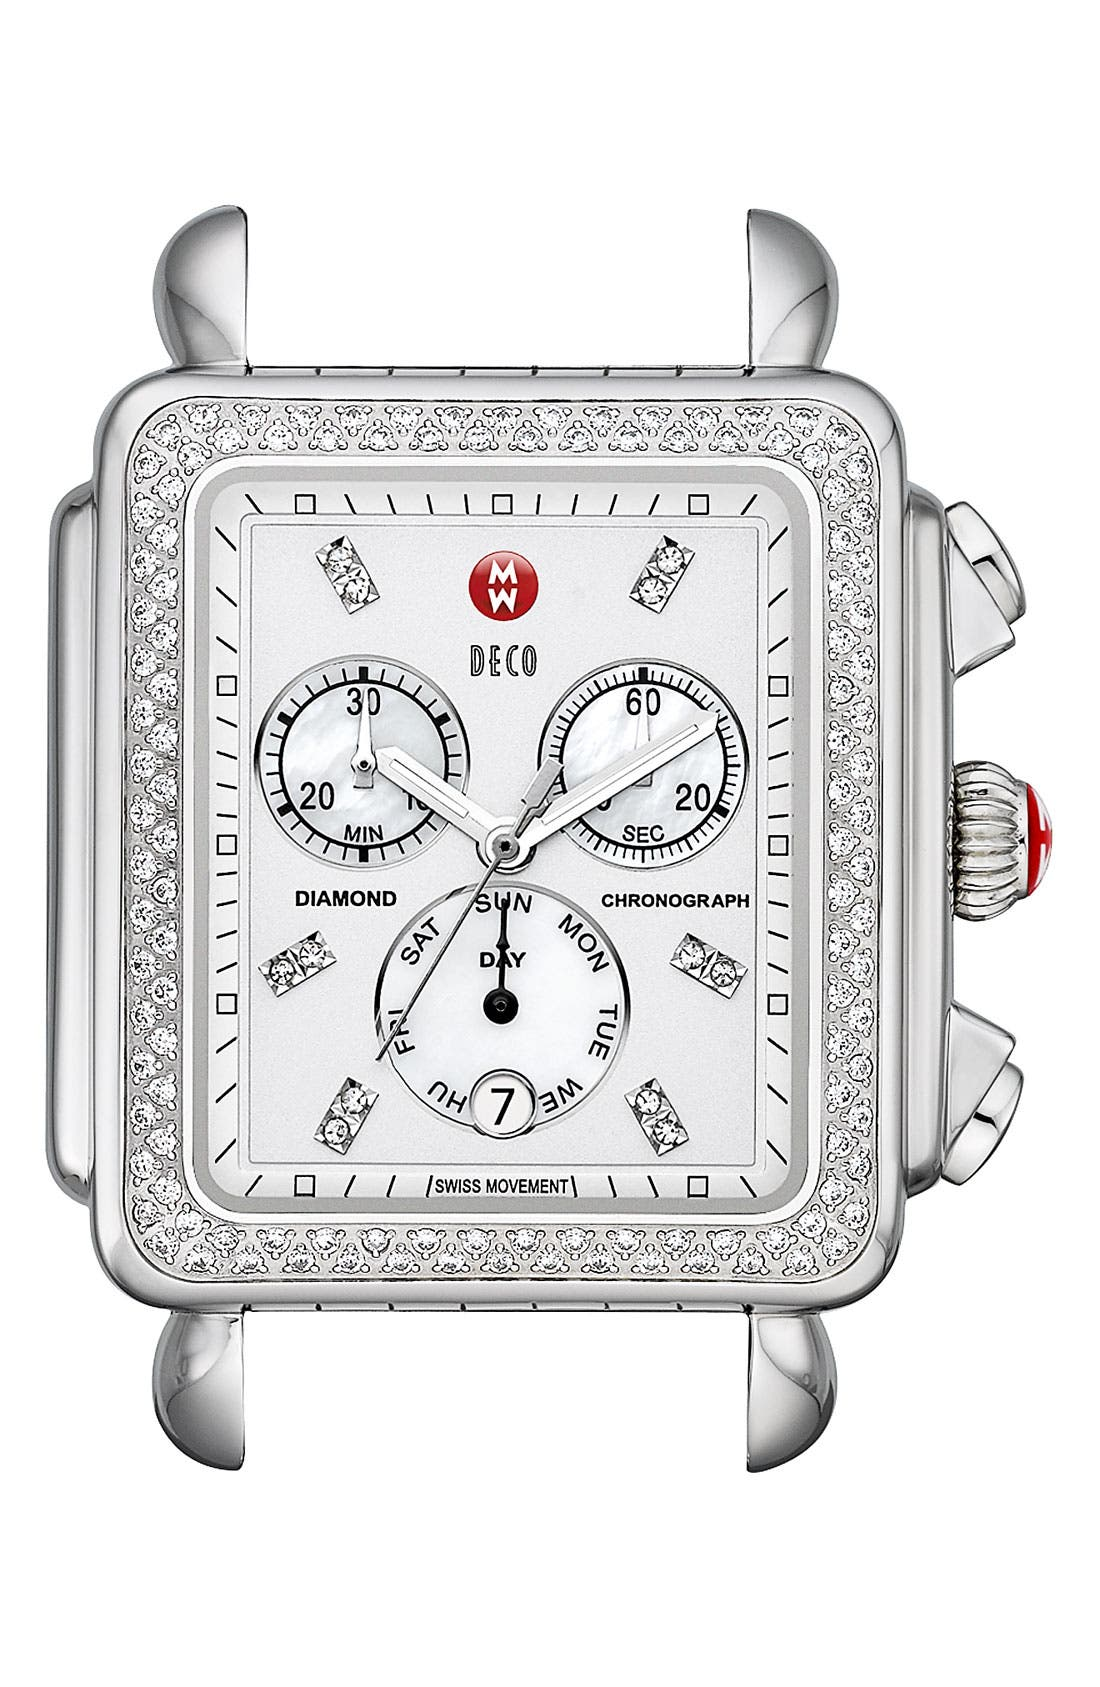 Main Image - MICHELE 'Deco XL Diamond' Diamond Dial Watch Case, 37mm x 38mm